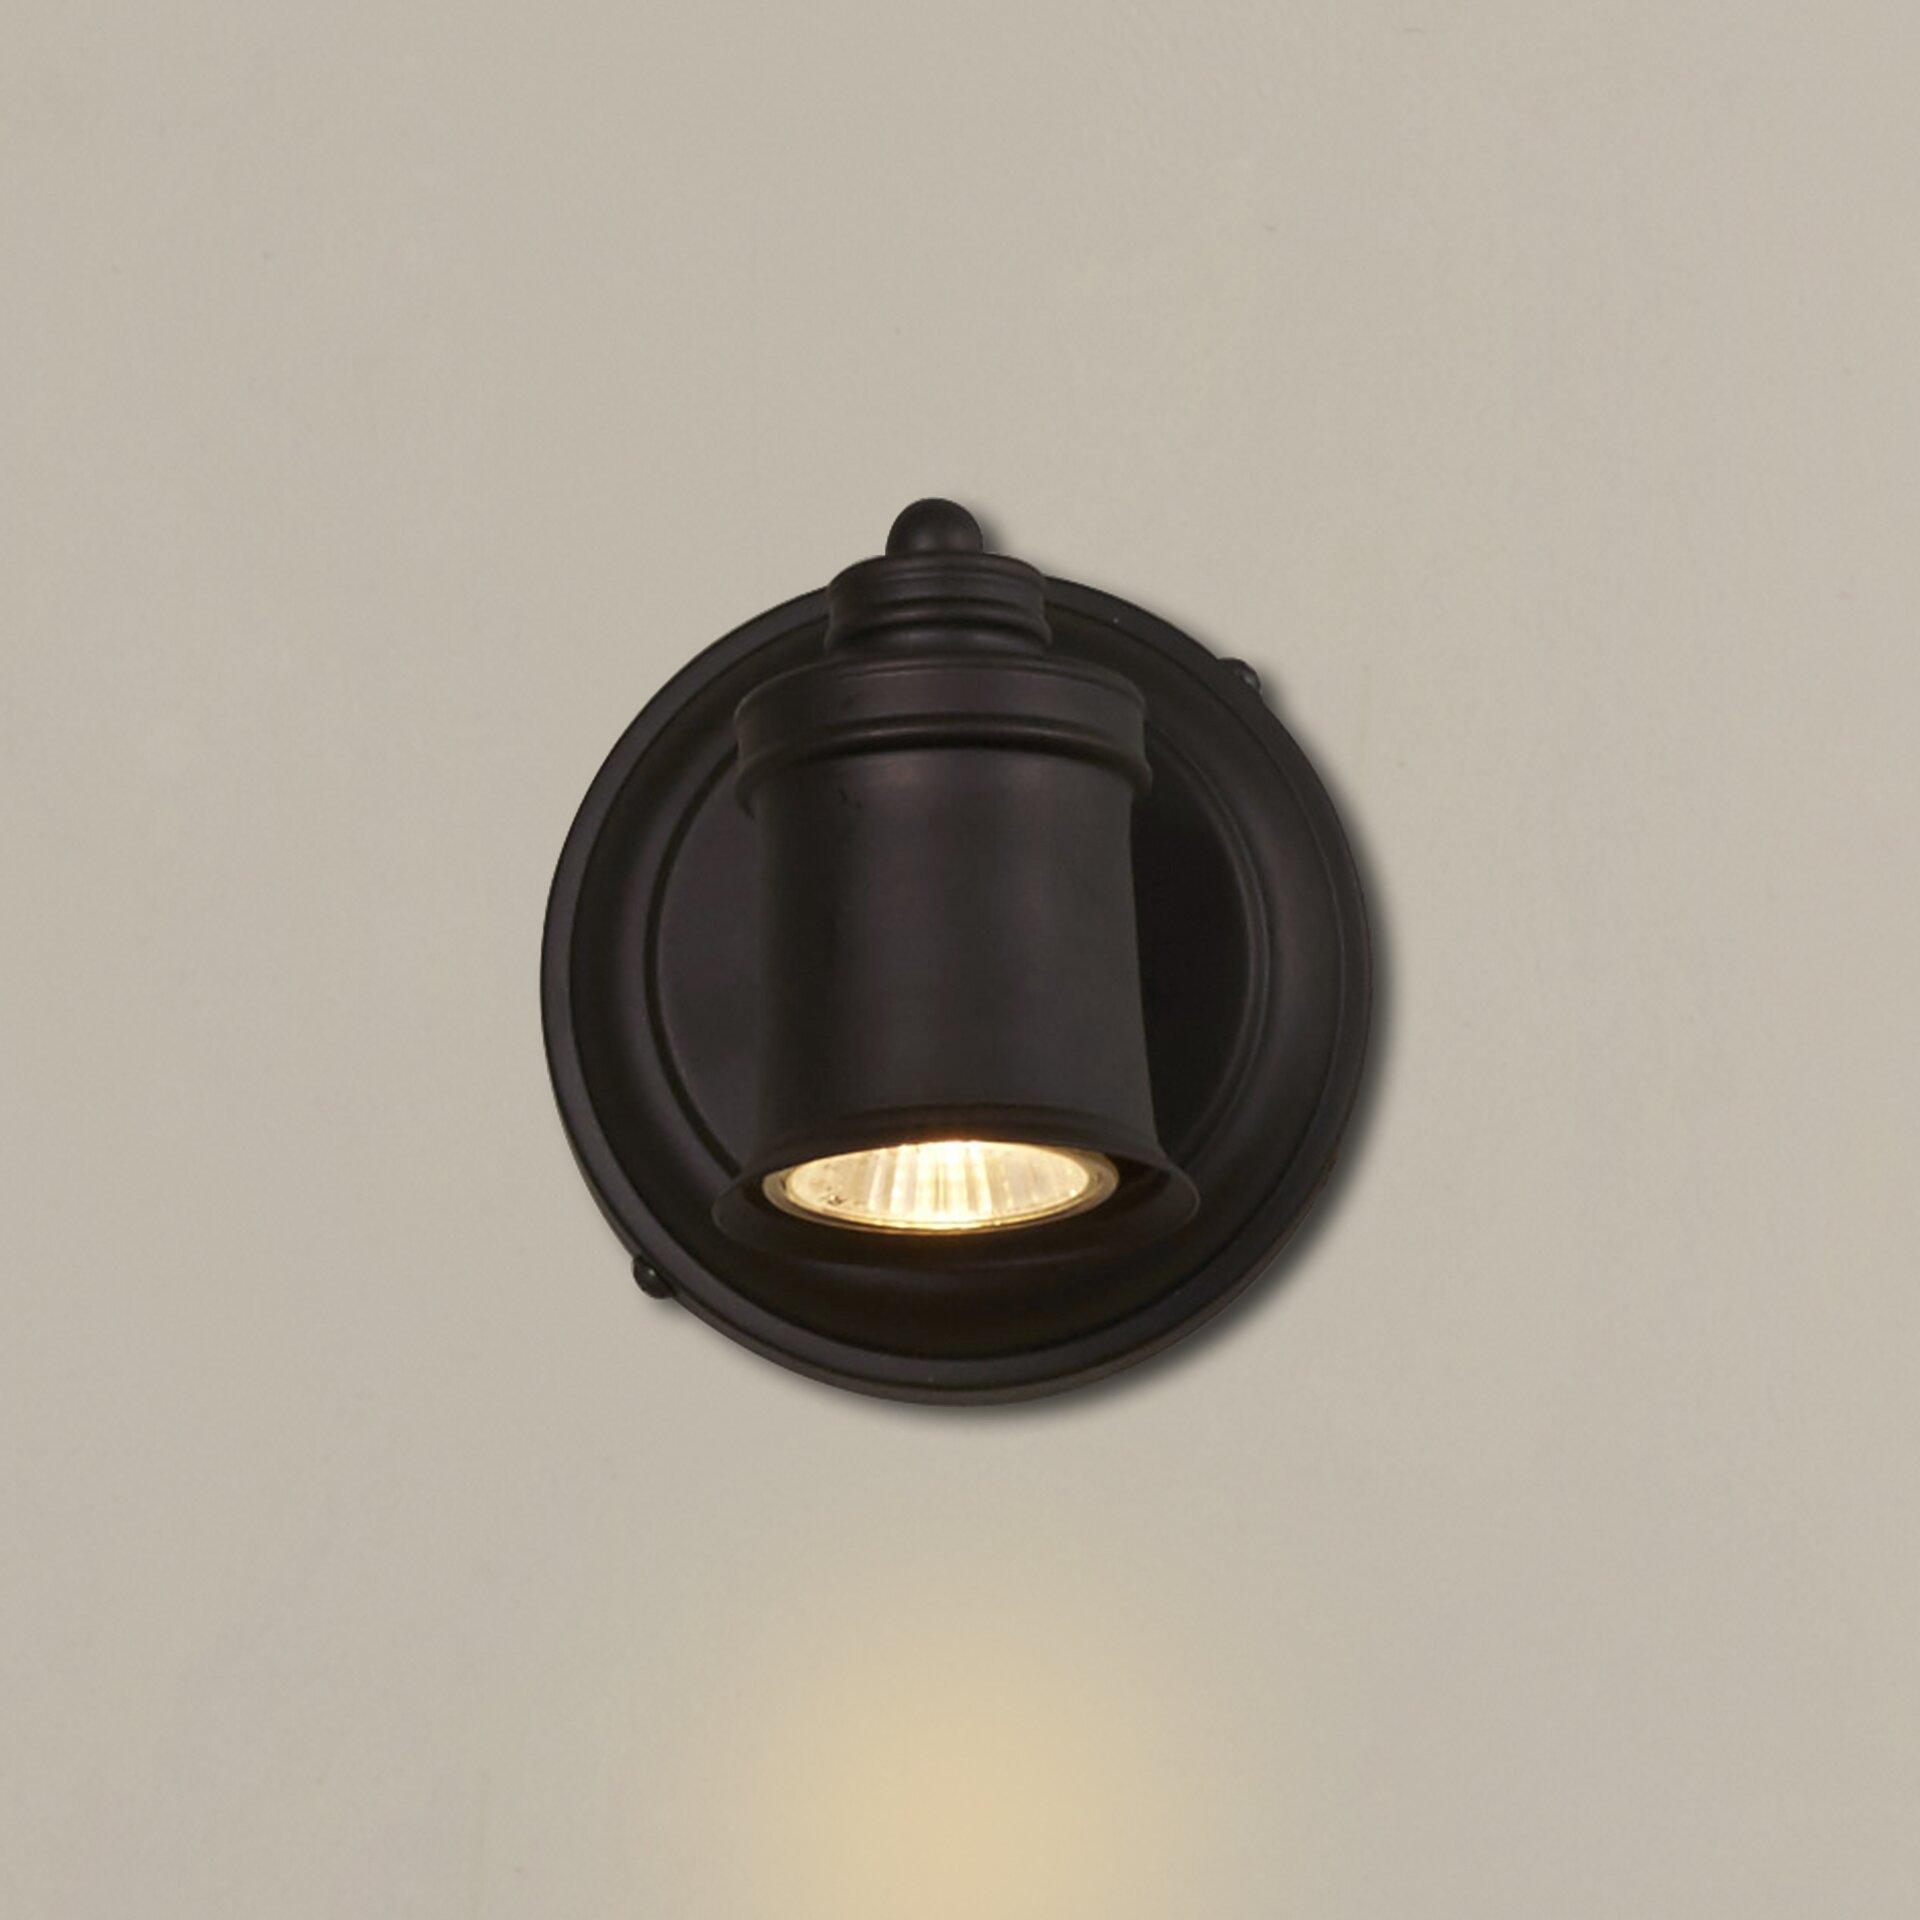 Wall Ceiling Lights Sets : Charlton Home Aspegreen 1 Light Ceiling/Wall Lights & Reviews Wayfair